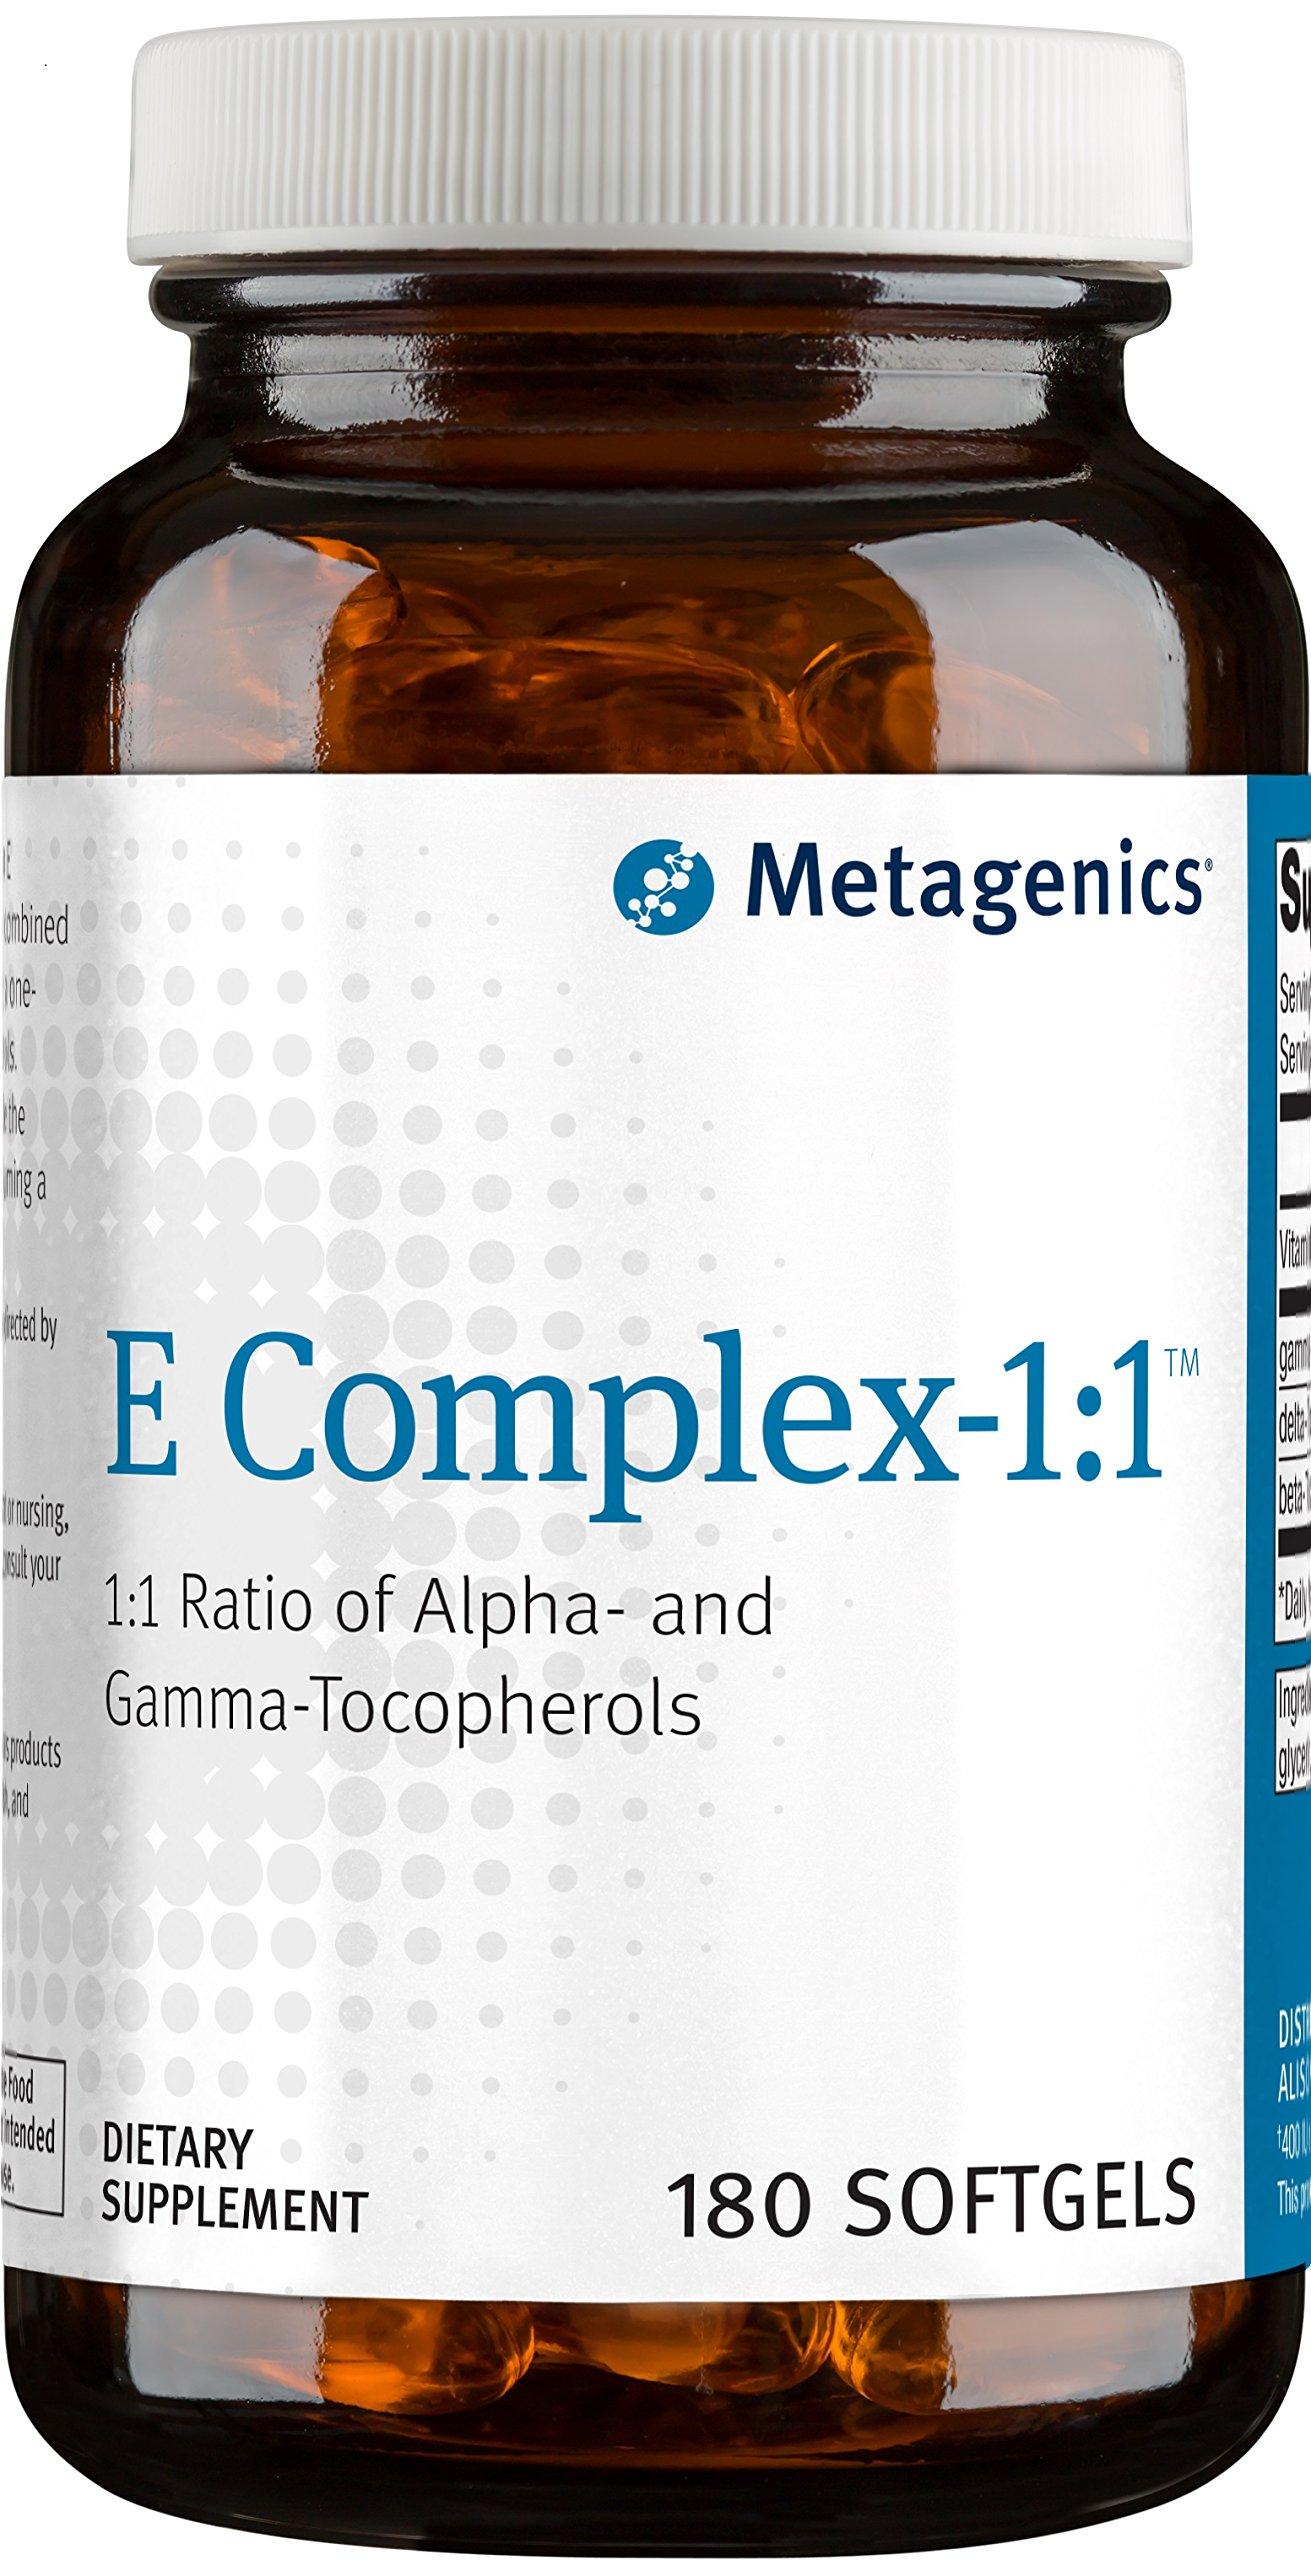 Metagenics - E Complex-1:1, 180 Count